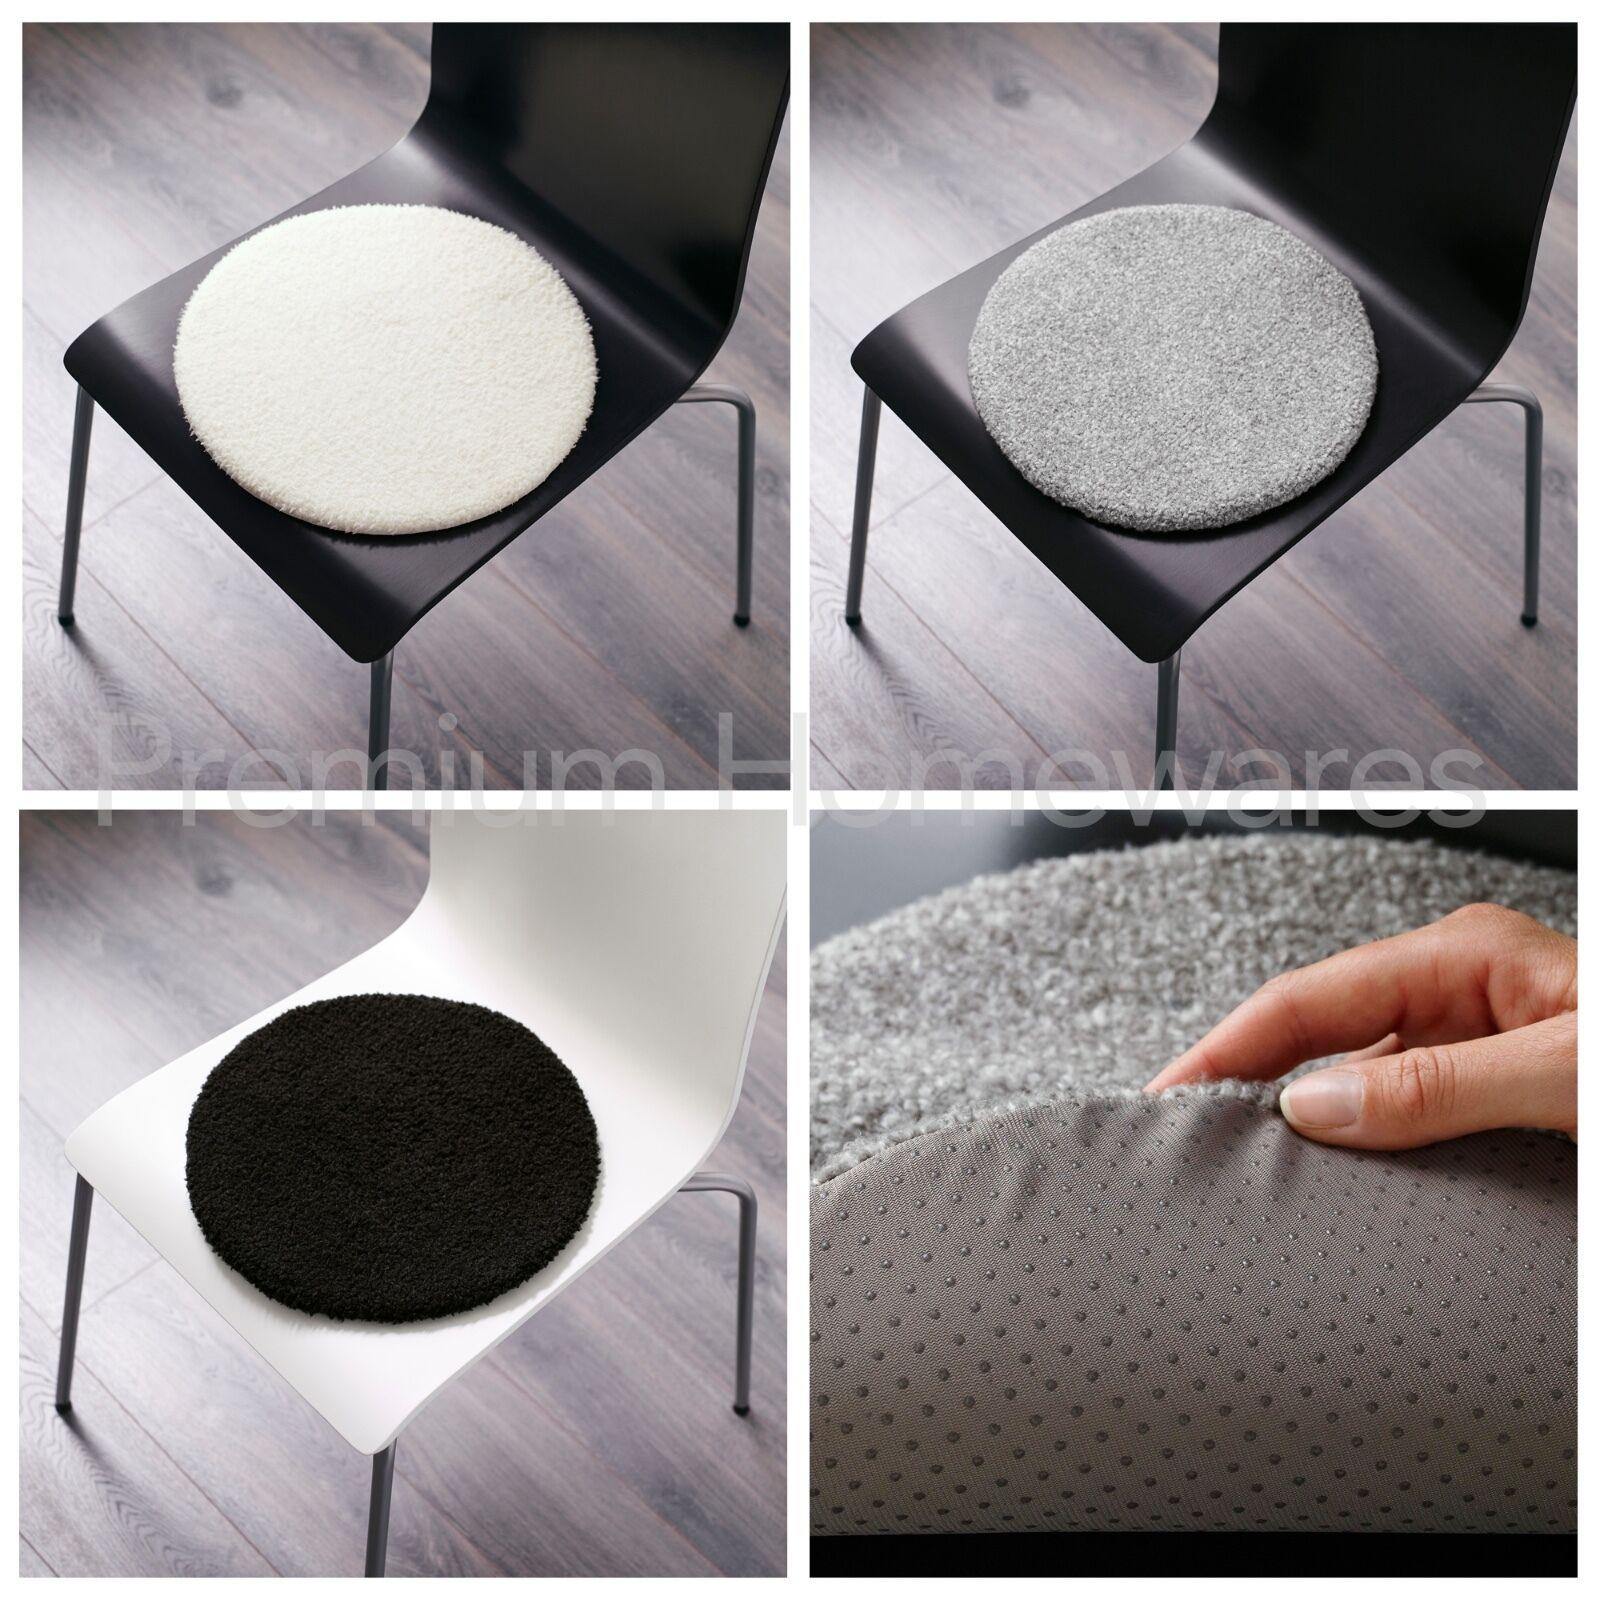 IKEA BERTIL 33cm Round Soft Foam Chair Pad BlackWhite  : s l1600 from www.ebay.co.uk size 1600 x 1600 jpeg 315kB